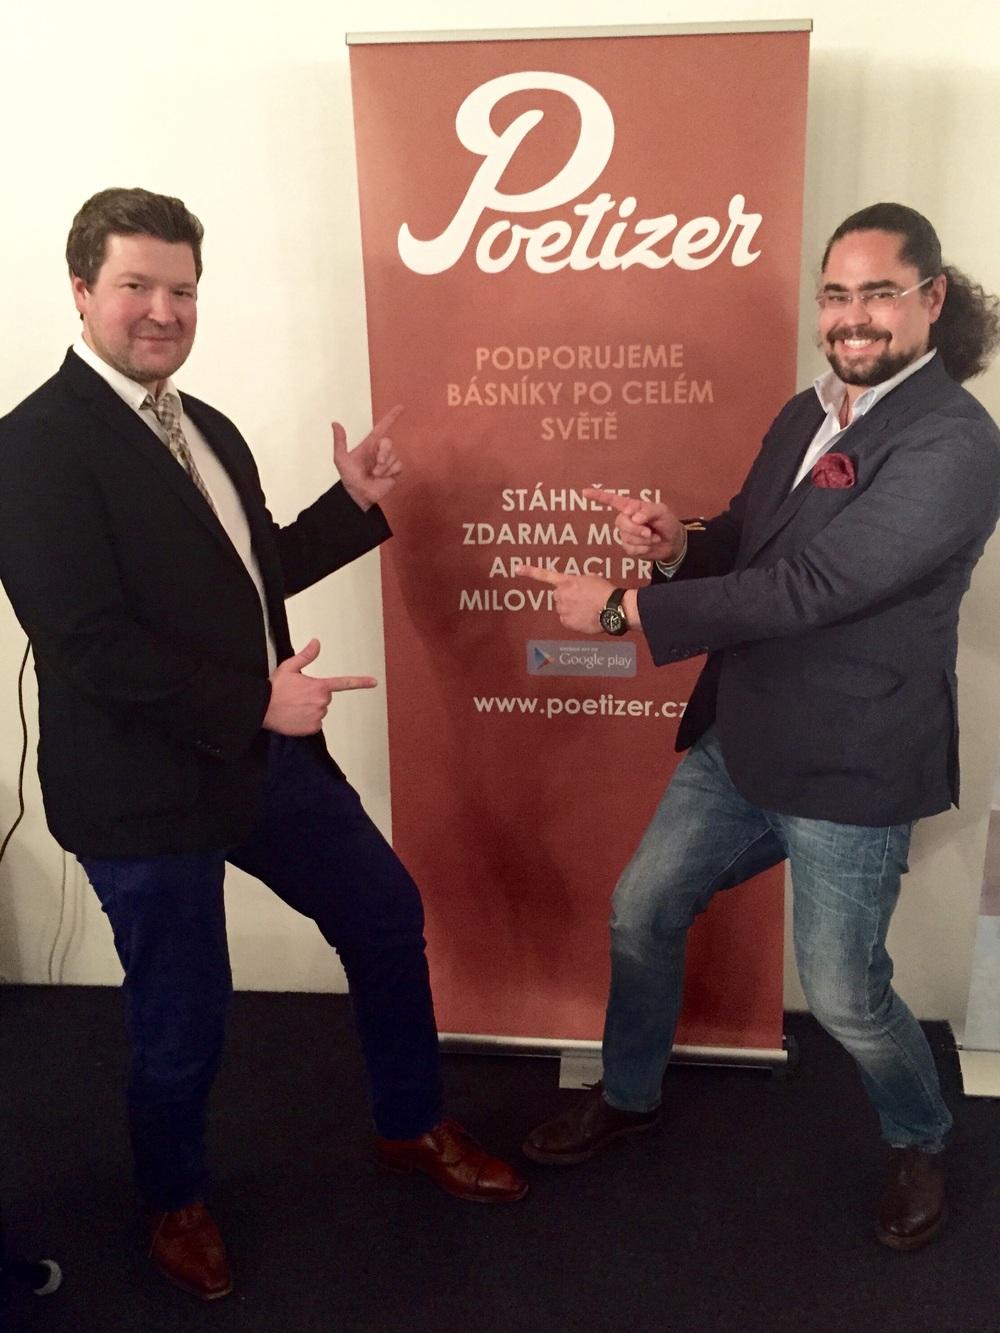 Lukáš Sedláček of ELAI and Tomáš Studeník, CD at Confidence Digital unveiling Poetizer app.